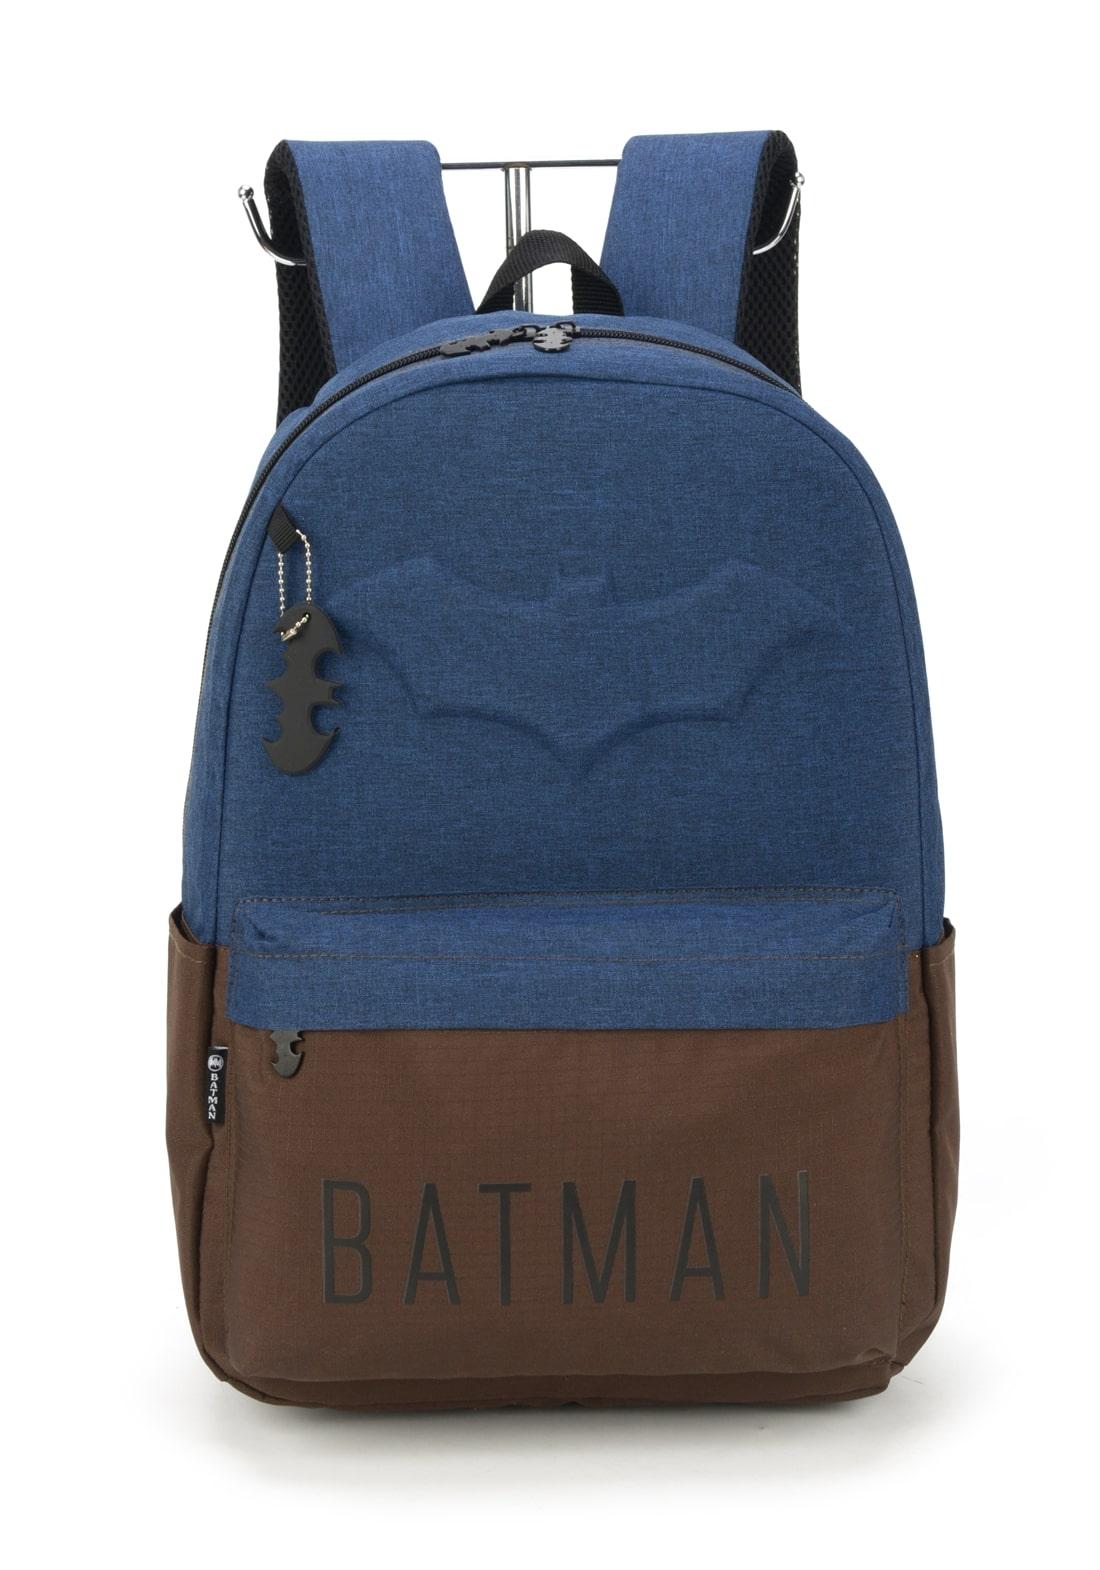 Mochila Batman Azul Marinho